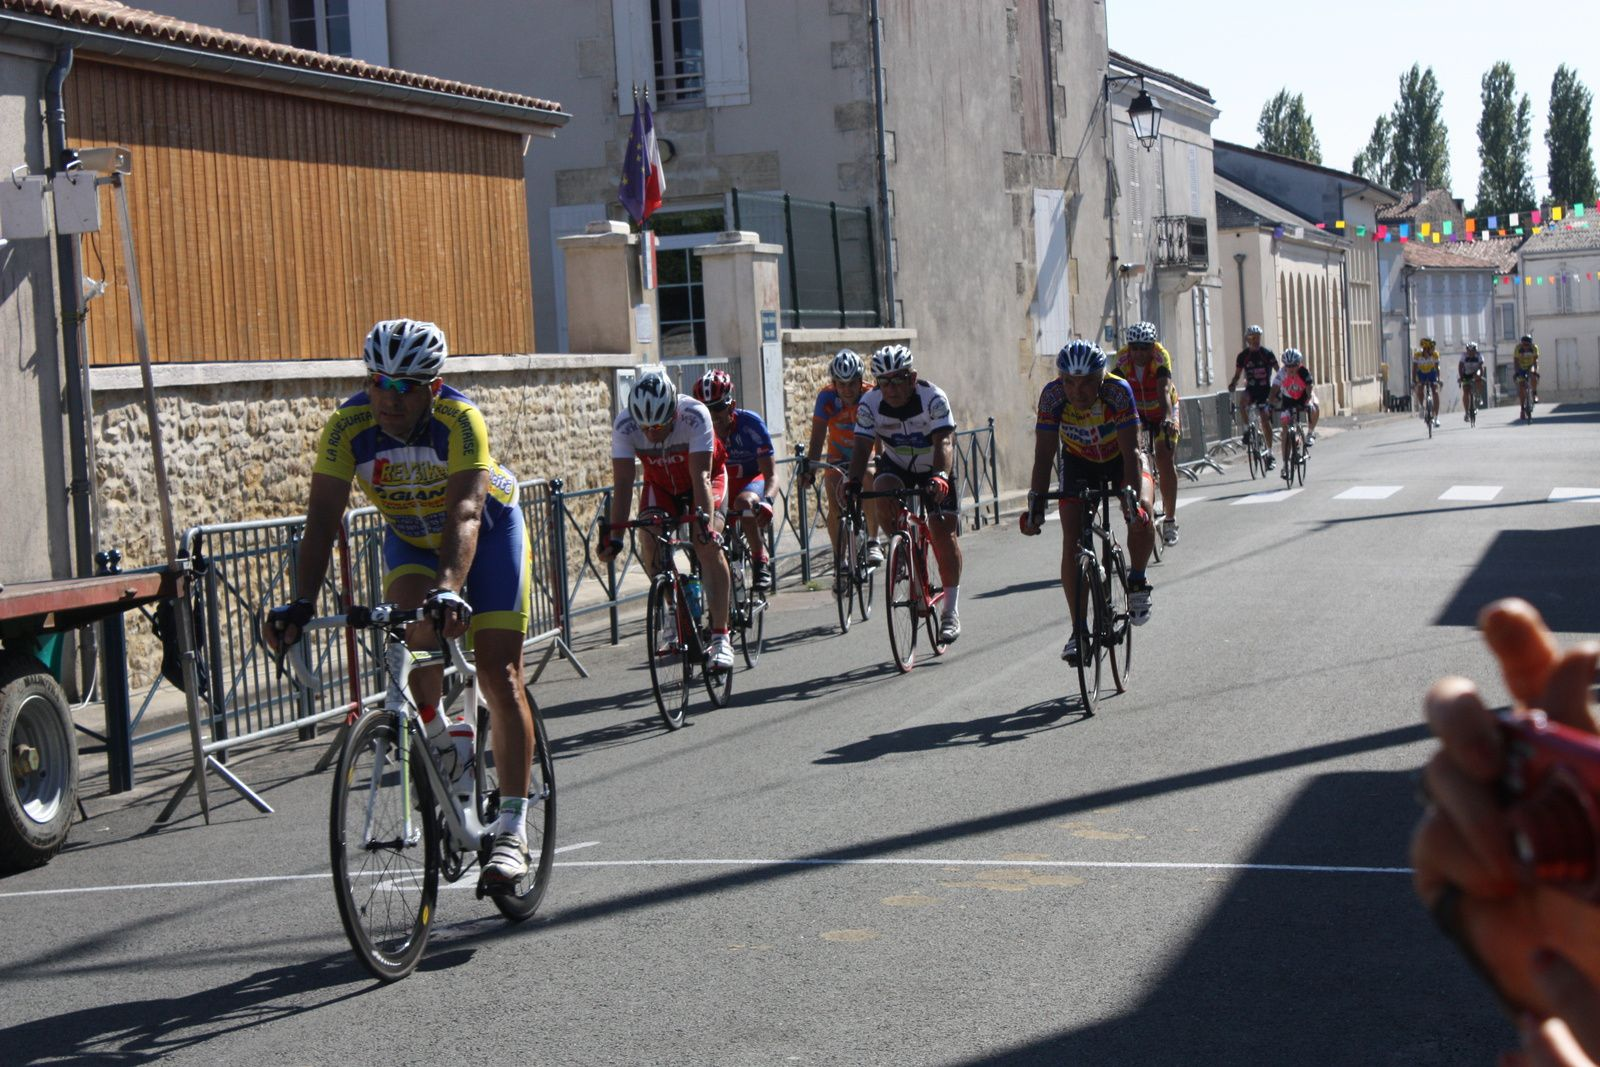 10e  Alain  ROUSSEAU(VC Le Gua), 11e  Benoit  CHASSERIAUD(R  Guataise), 12e  Jean-Pierre  COTTENCEAU(VC  Saintes), 13e  David  CHIARAPPA (NL), 15e  Ghilslain  GAILLARD(NL), 16e  Christian  GAUTHIER(AL  Gond Pontouvre),